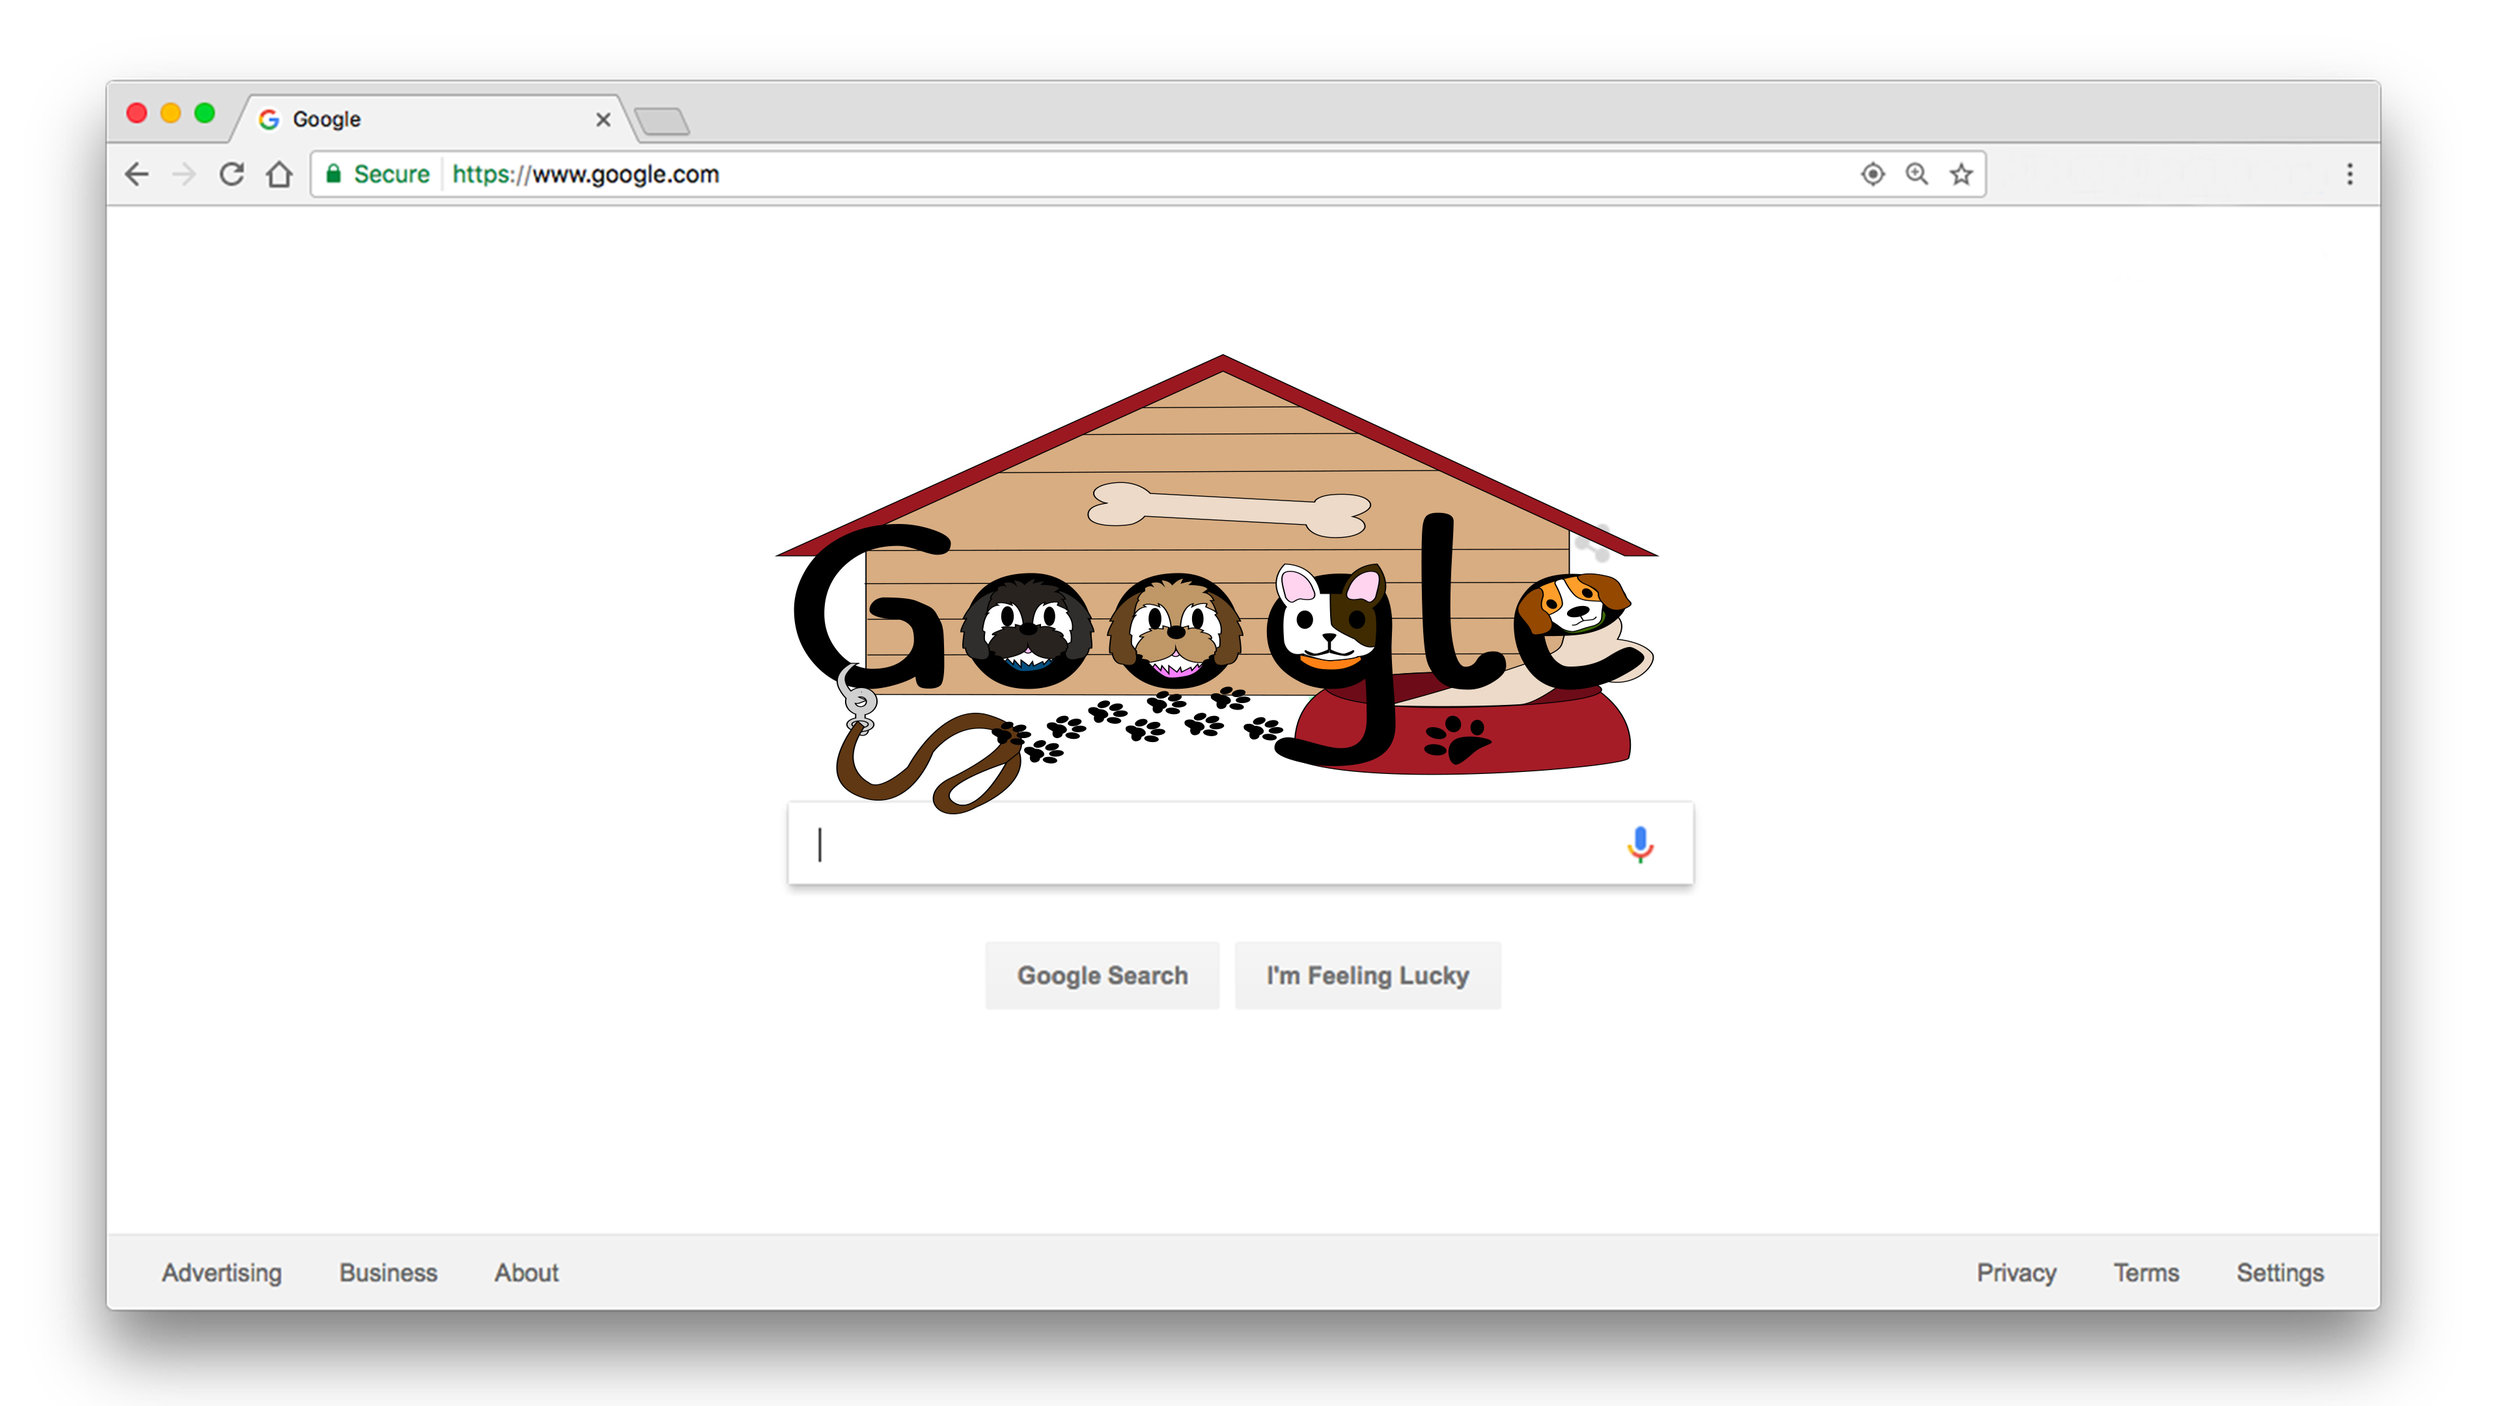 bonginimia_6295375_117281214_Google Doodle Final.jpg